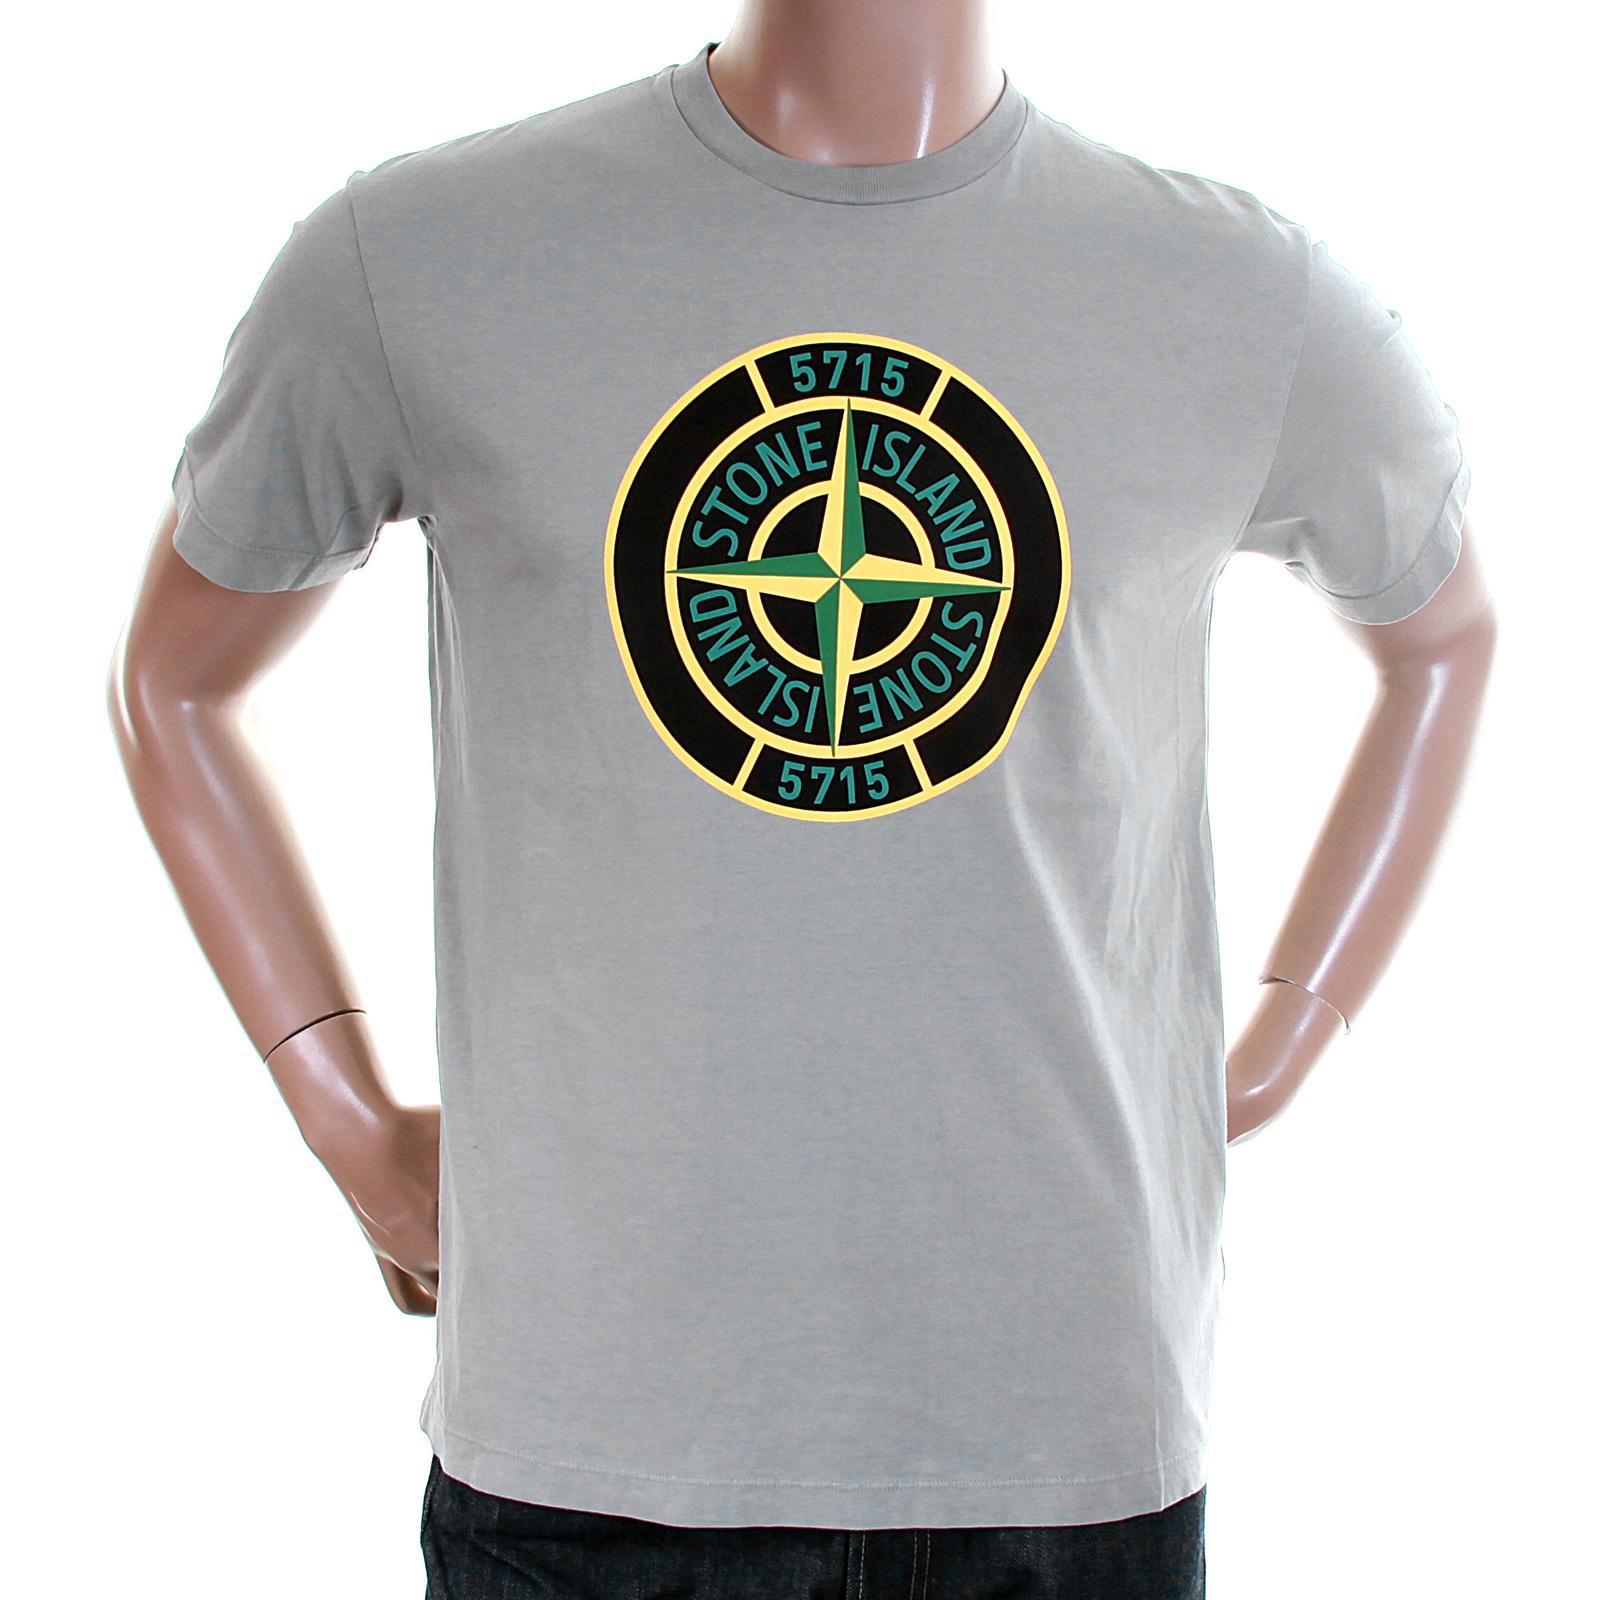 8673ce492bed Stone Island mens grey 561520181 compass logo tee shirt SI2114 at Togged  Clothing